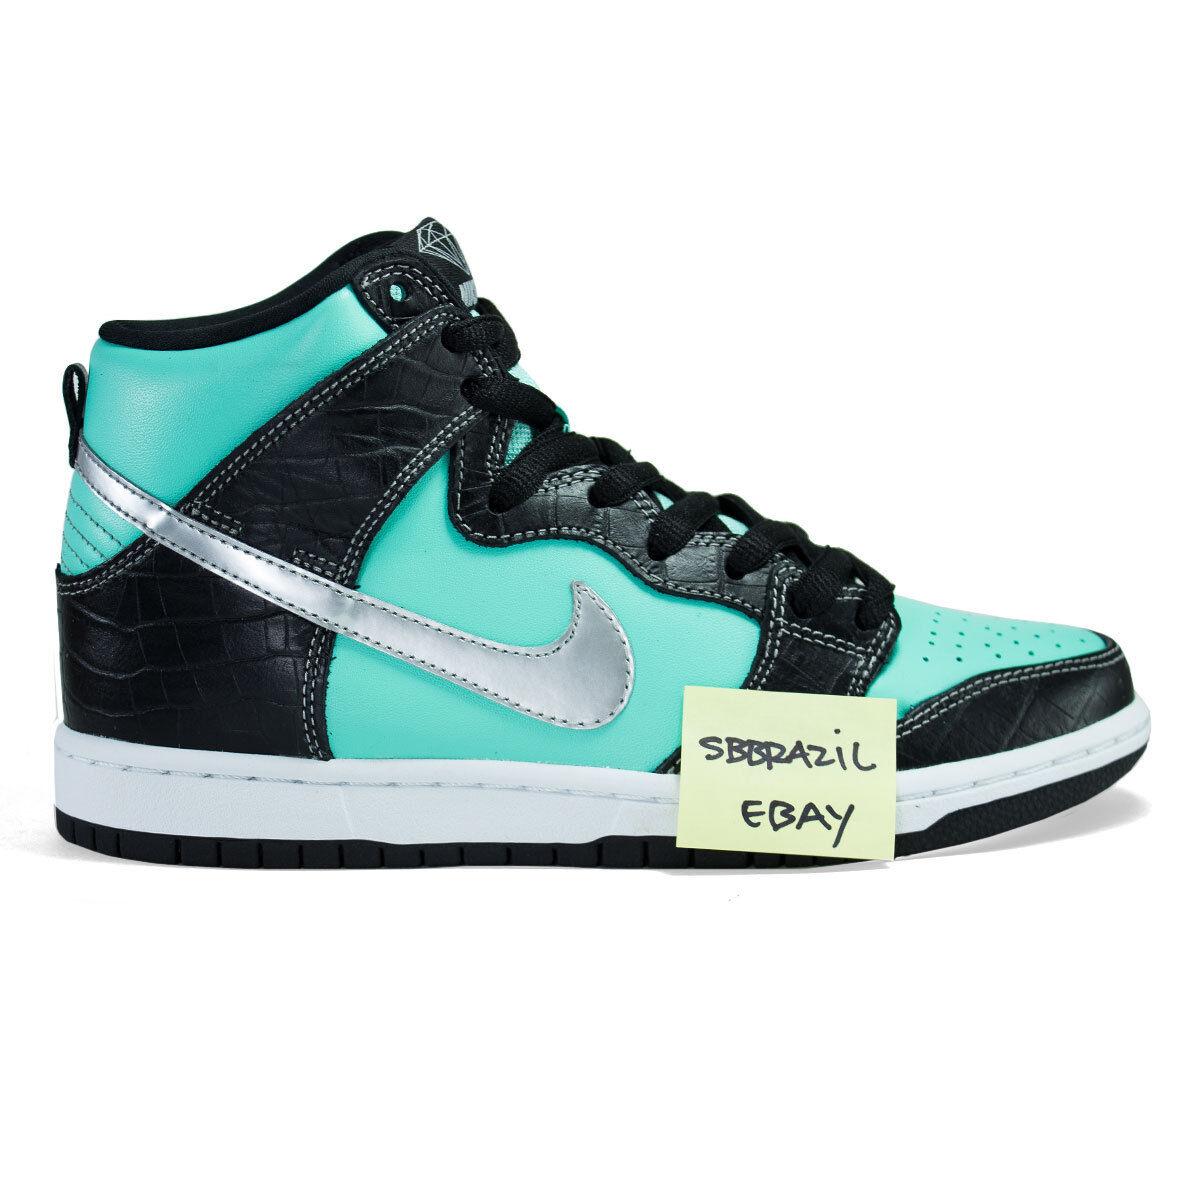 NIKE SB DUNK HIGH DIAMOND X TIFF US 11 huf max what medicom jordan lance Wild casual shoes